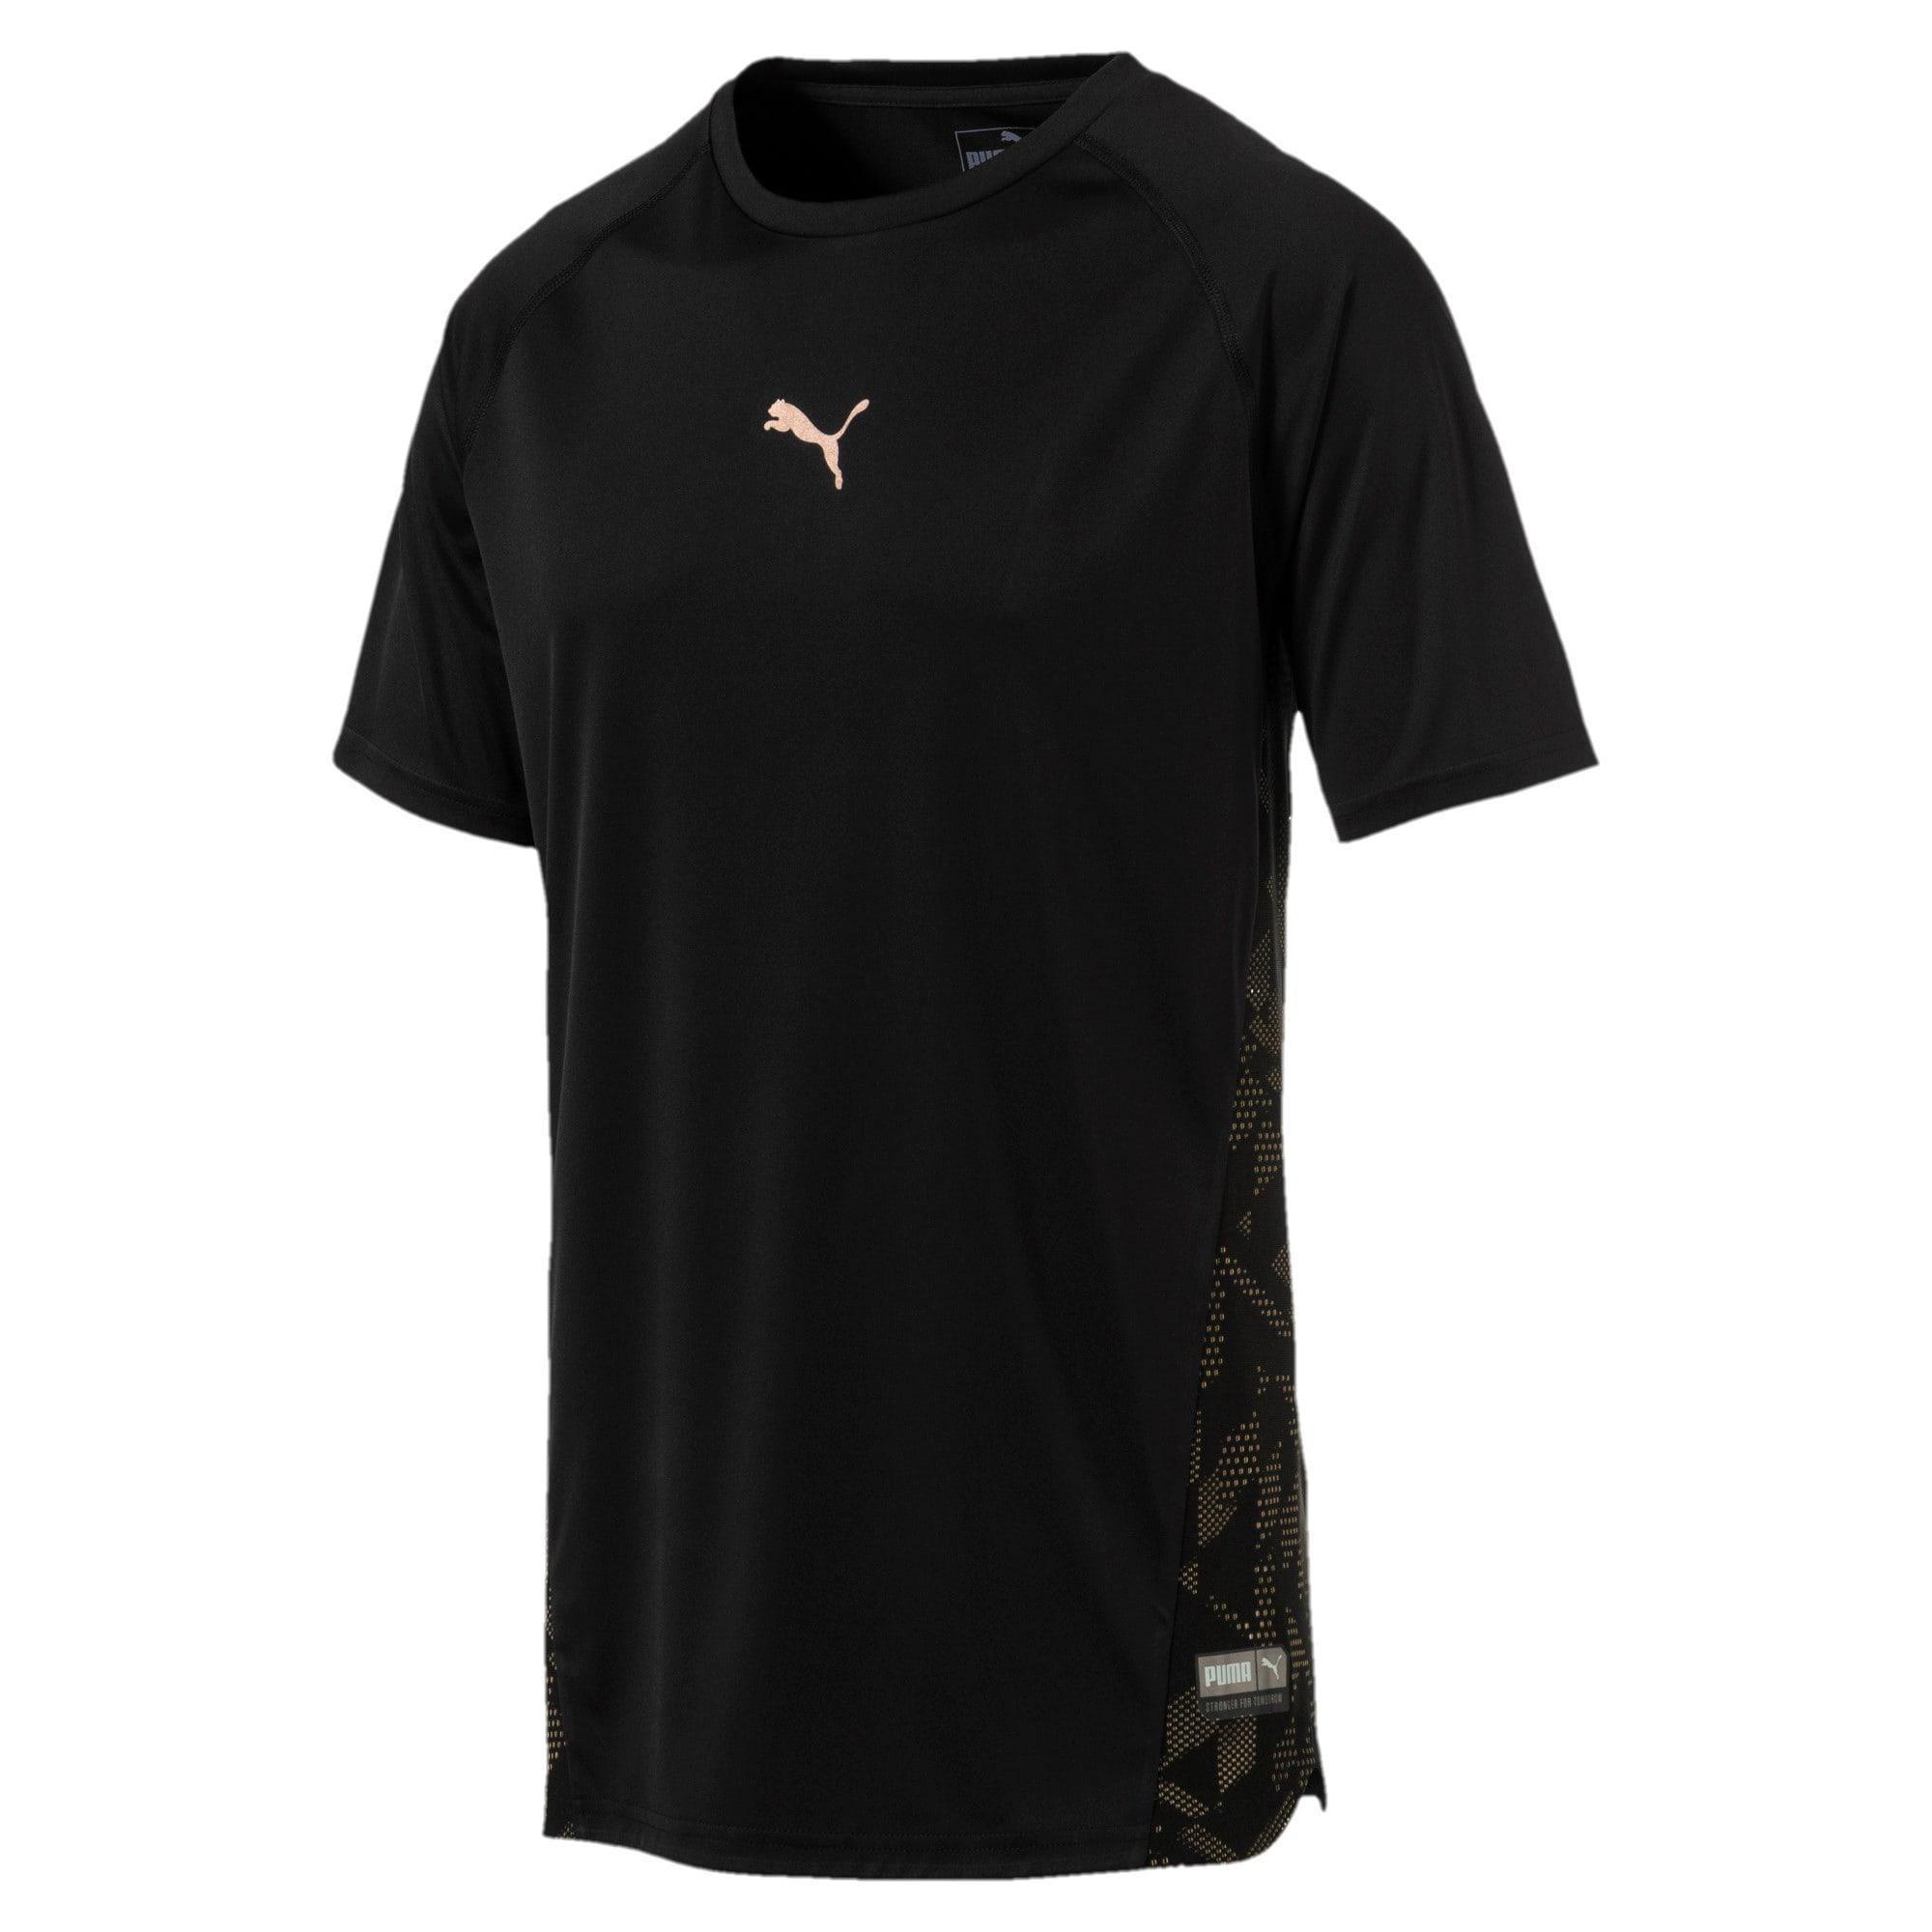 Thumbnail 1 of VENT Short Sleeve Men's Training Top, Puma Black-Q4, medium-IND